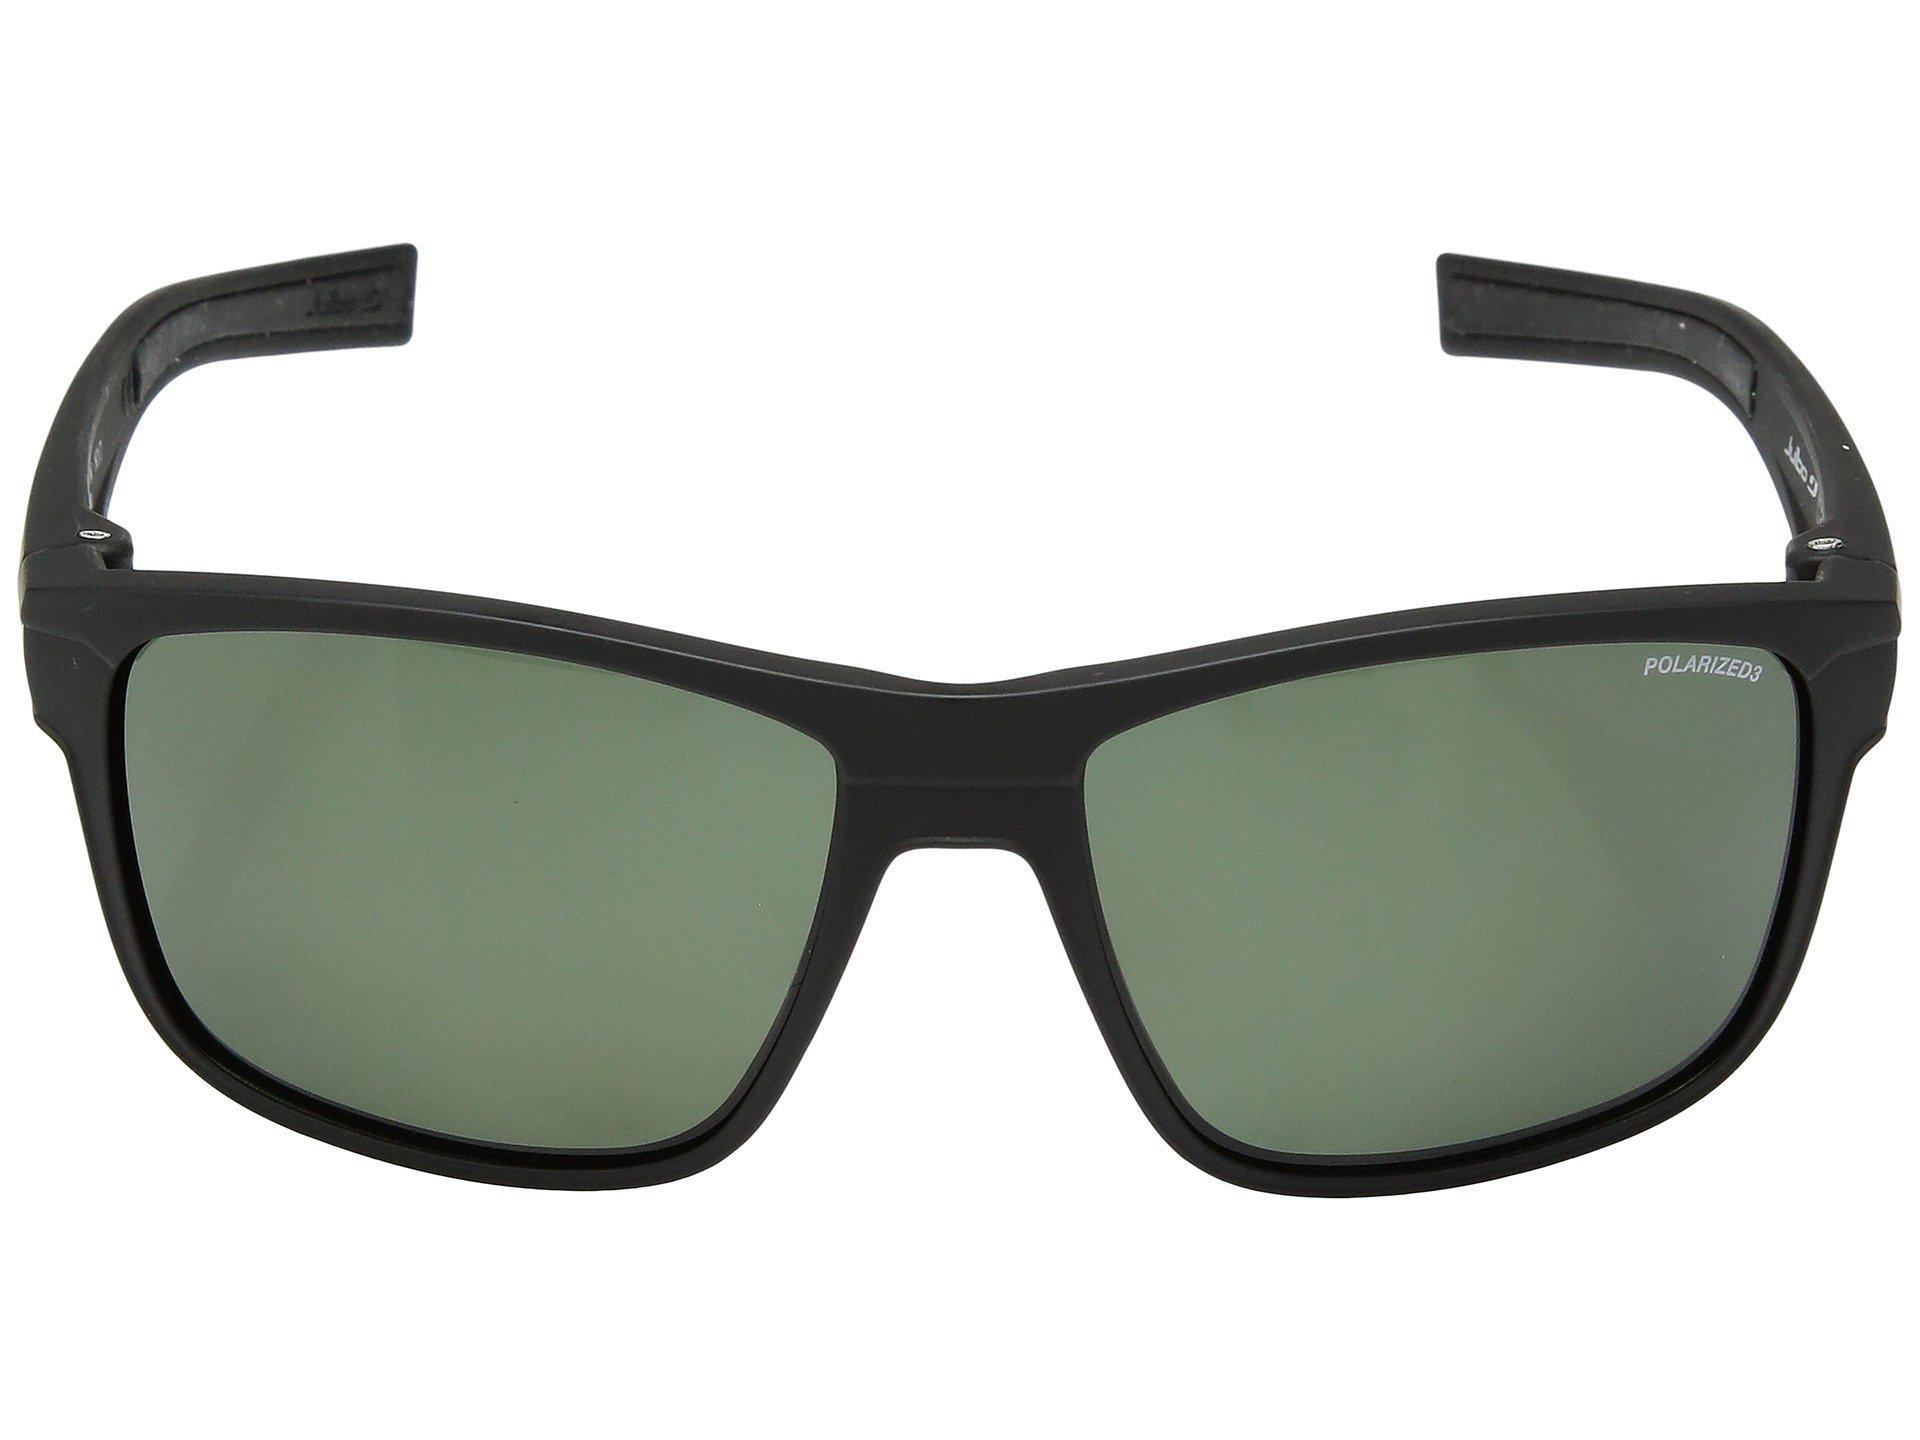 dea2553c0e Julbo Eyewear - Renegade (matte Black black) Athletic Performance Sport  Sunglasses for Men. View fullscreen